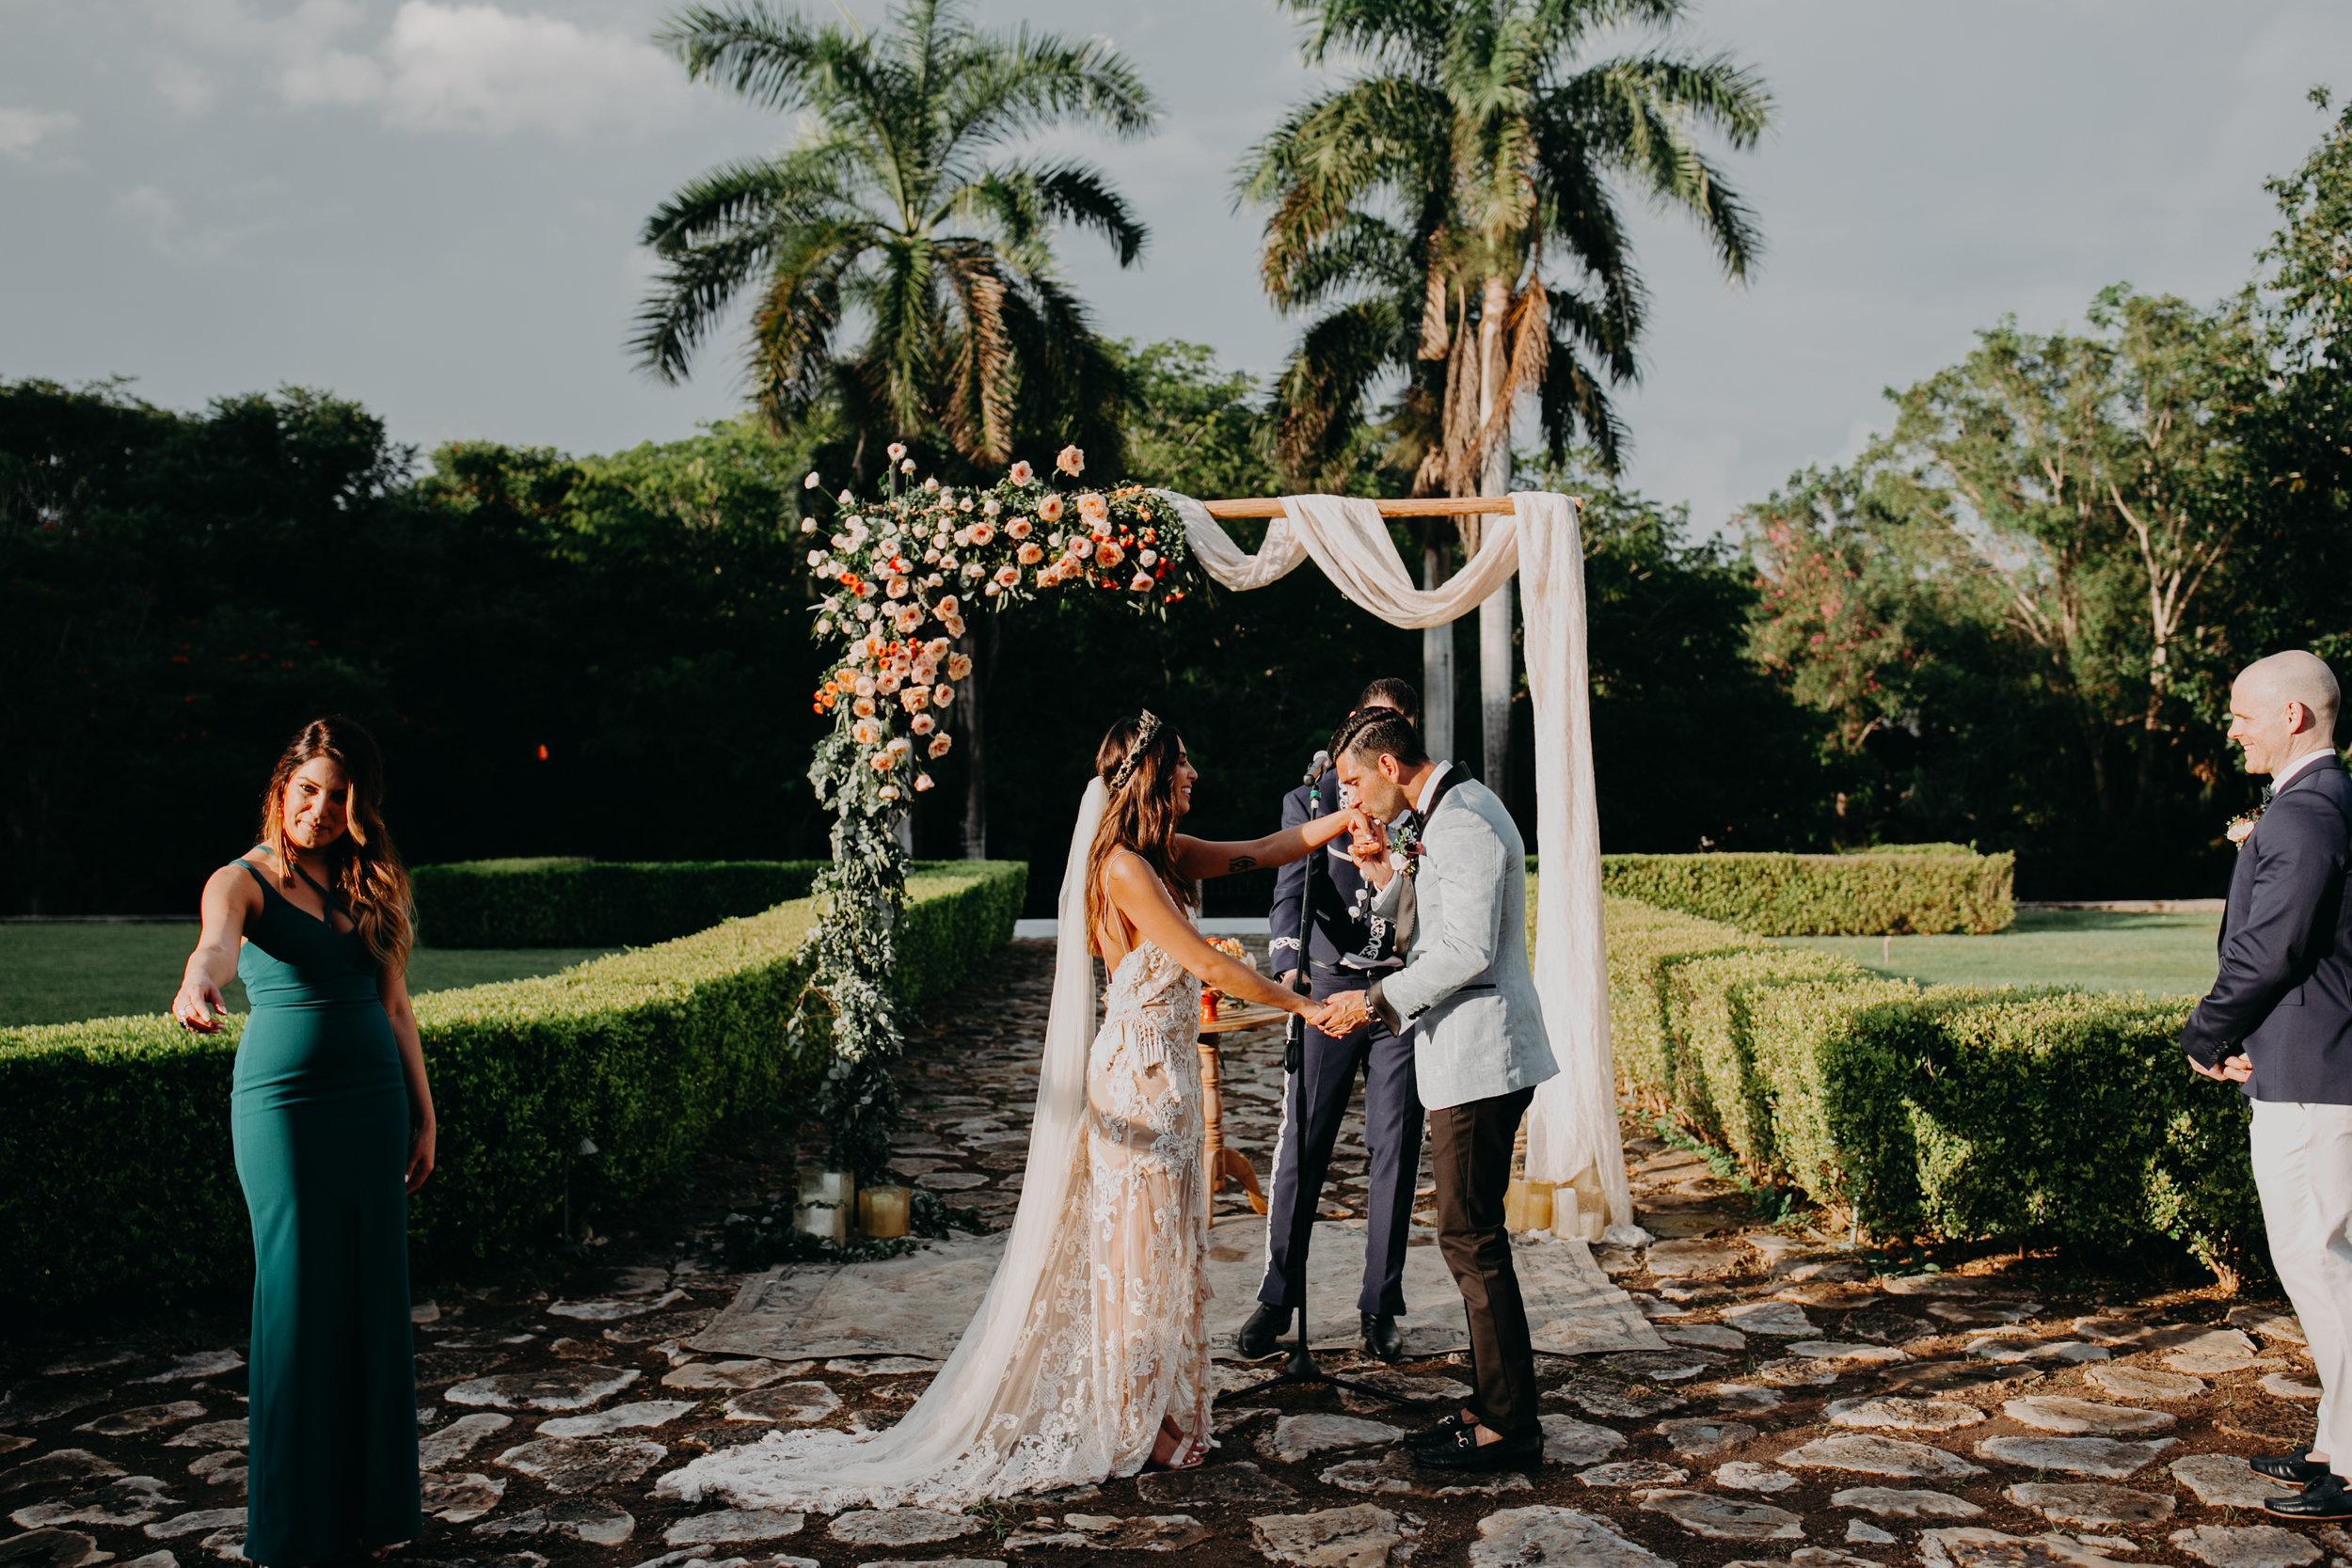 Hacienda Temozon Yucatan Mexico Wedding | Ida & Peter Emily Magers Photography-991.jpg